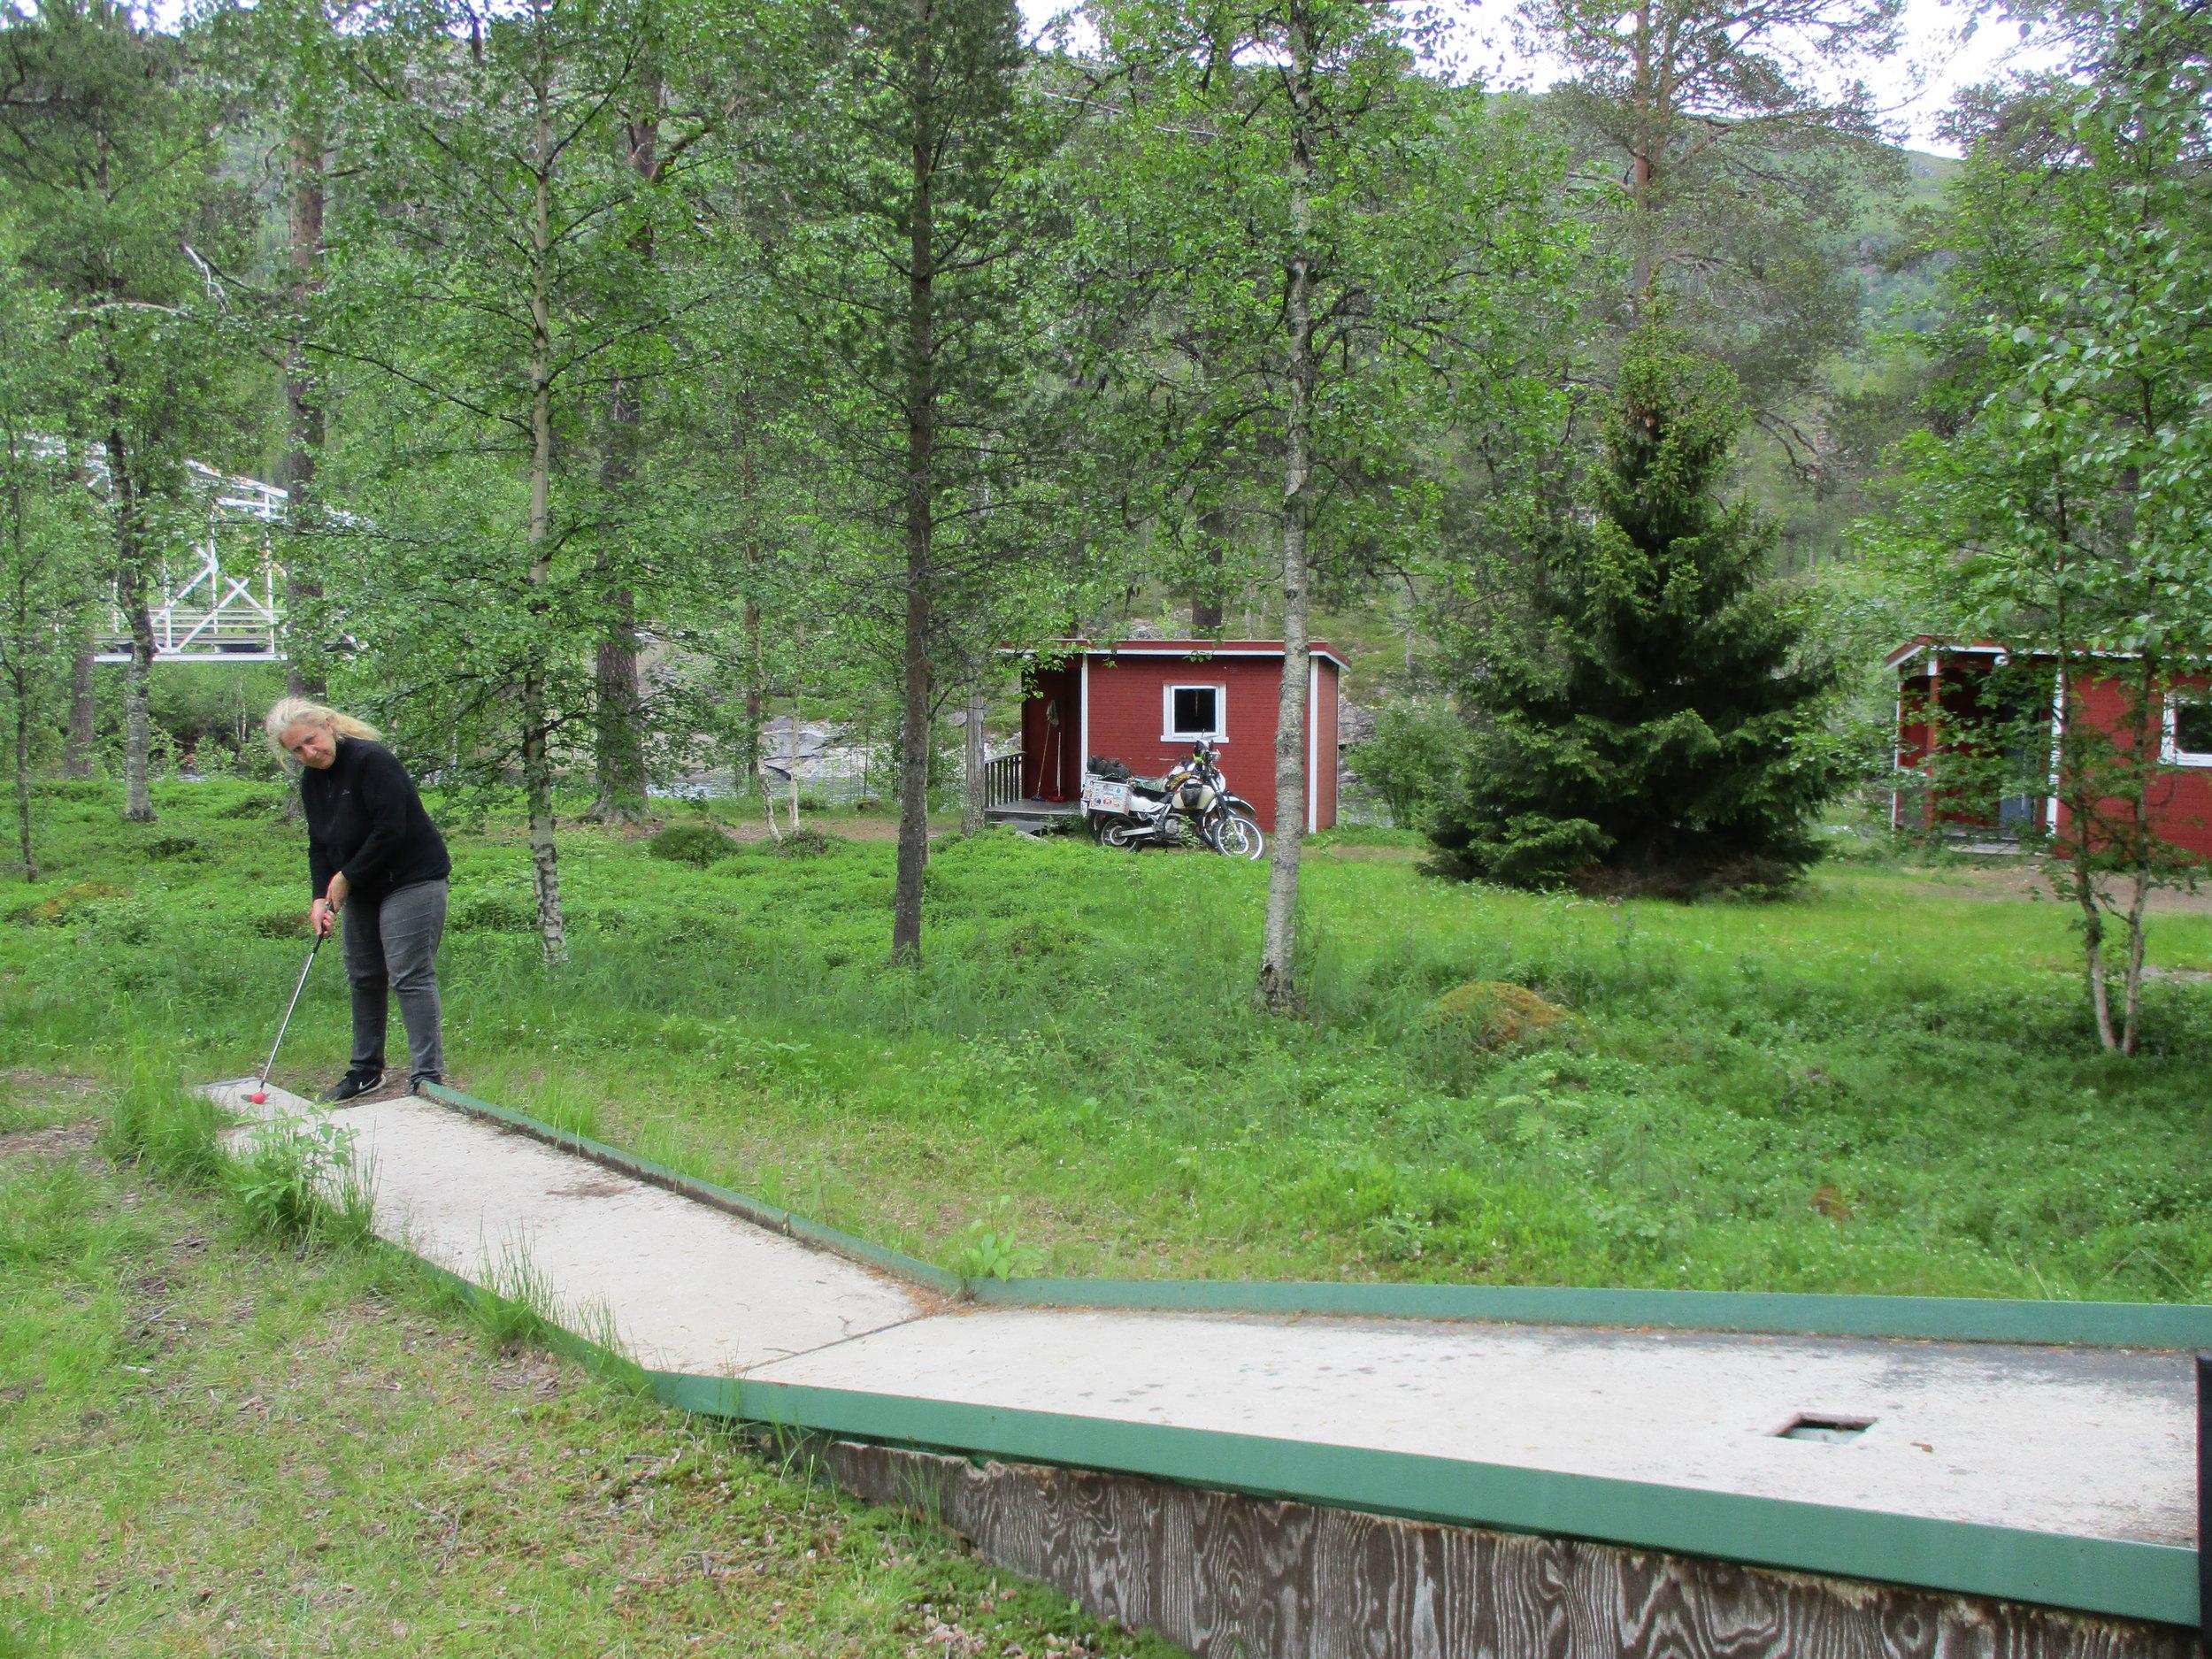 Krokstrand camp site - bit of Pitch and Putt